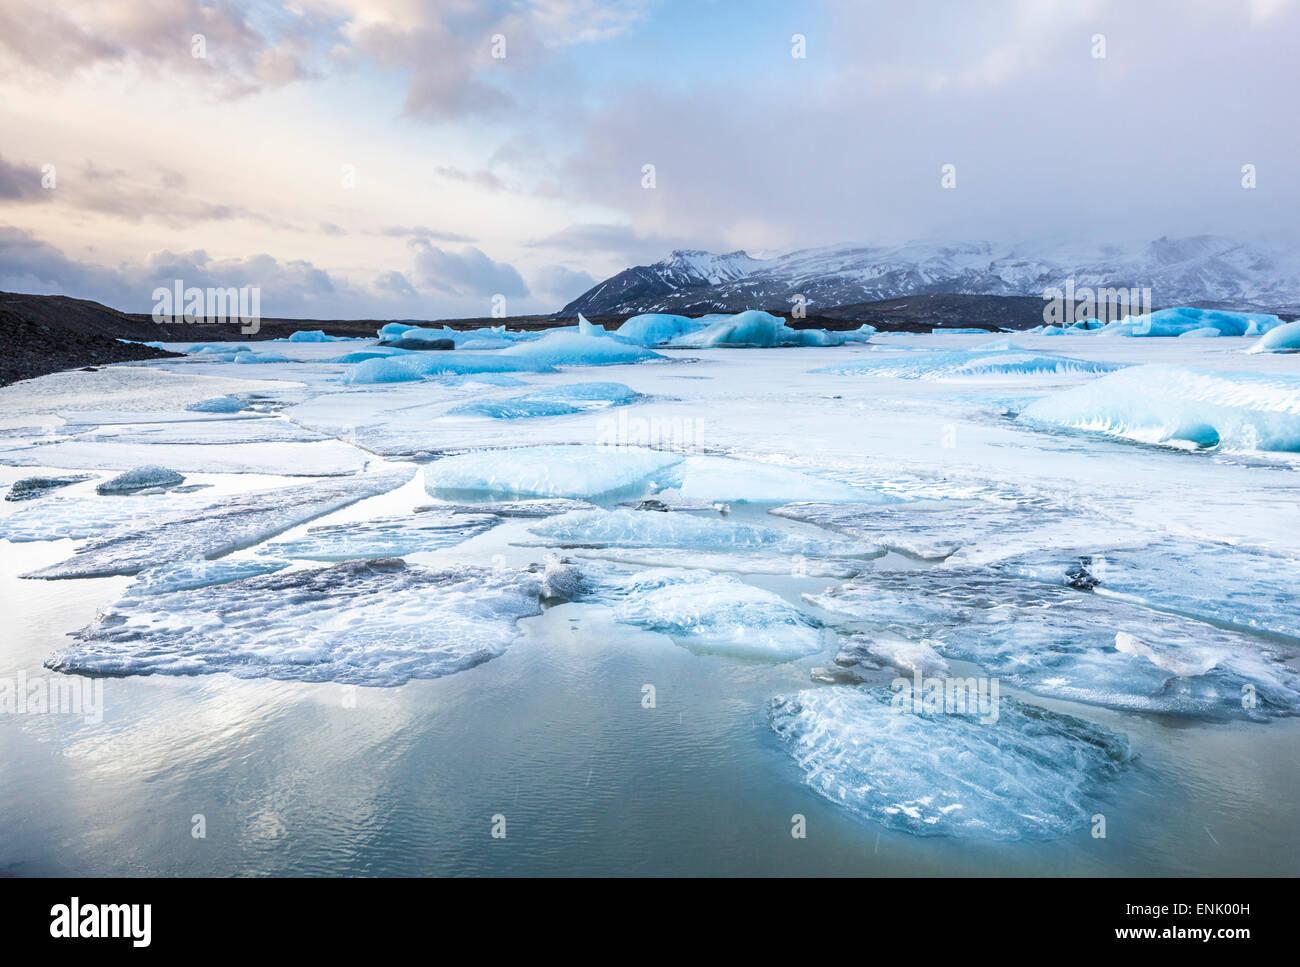 Frozen icebergs locked in the frozen waters of Fjallsarlon Glacier lagoon, South East Iceland, Iceland, Polar Regions - Stock Image